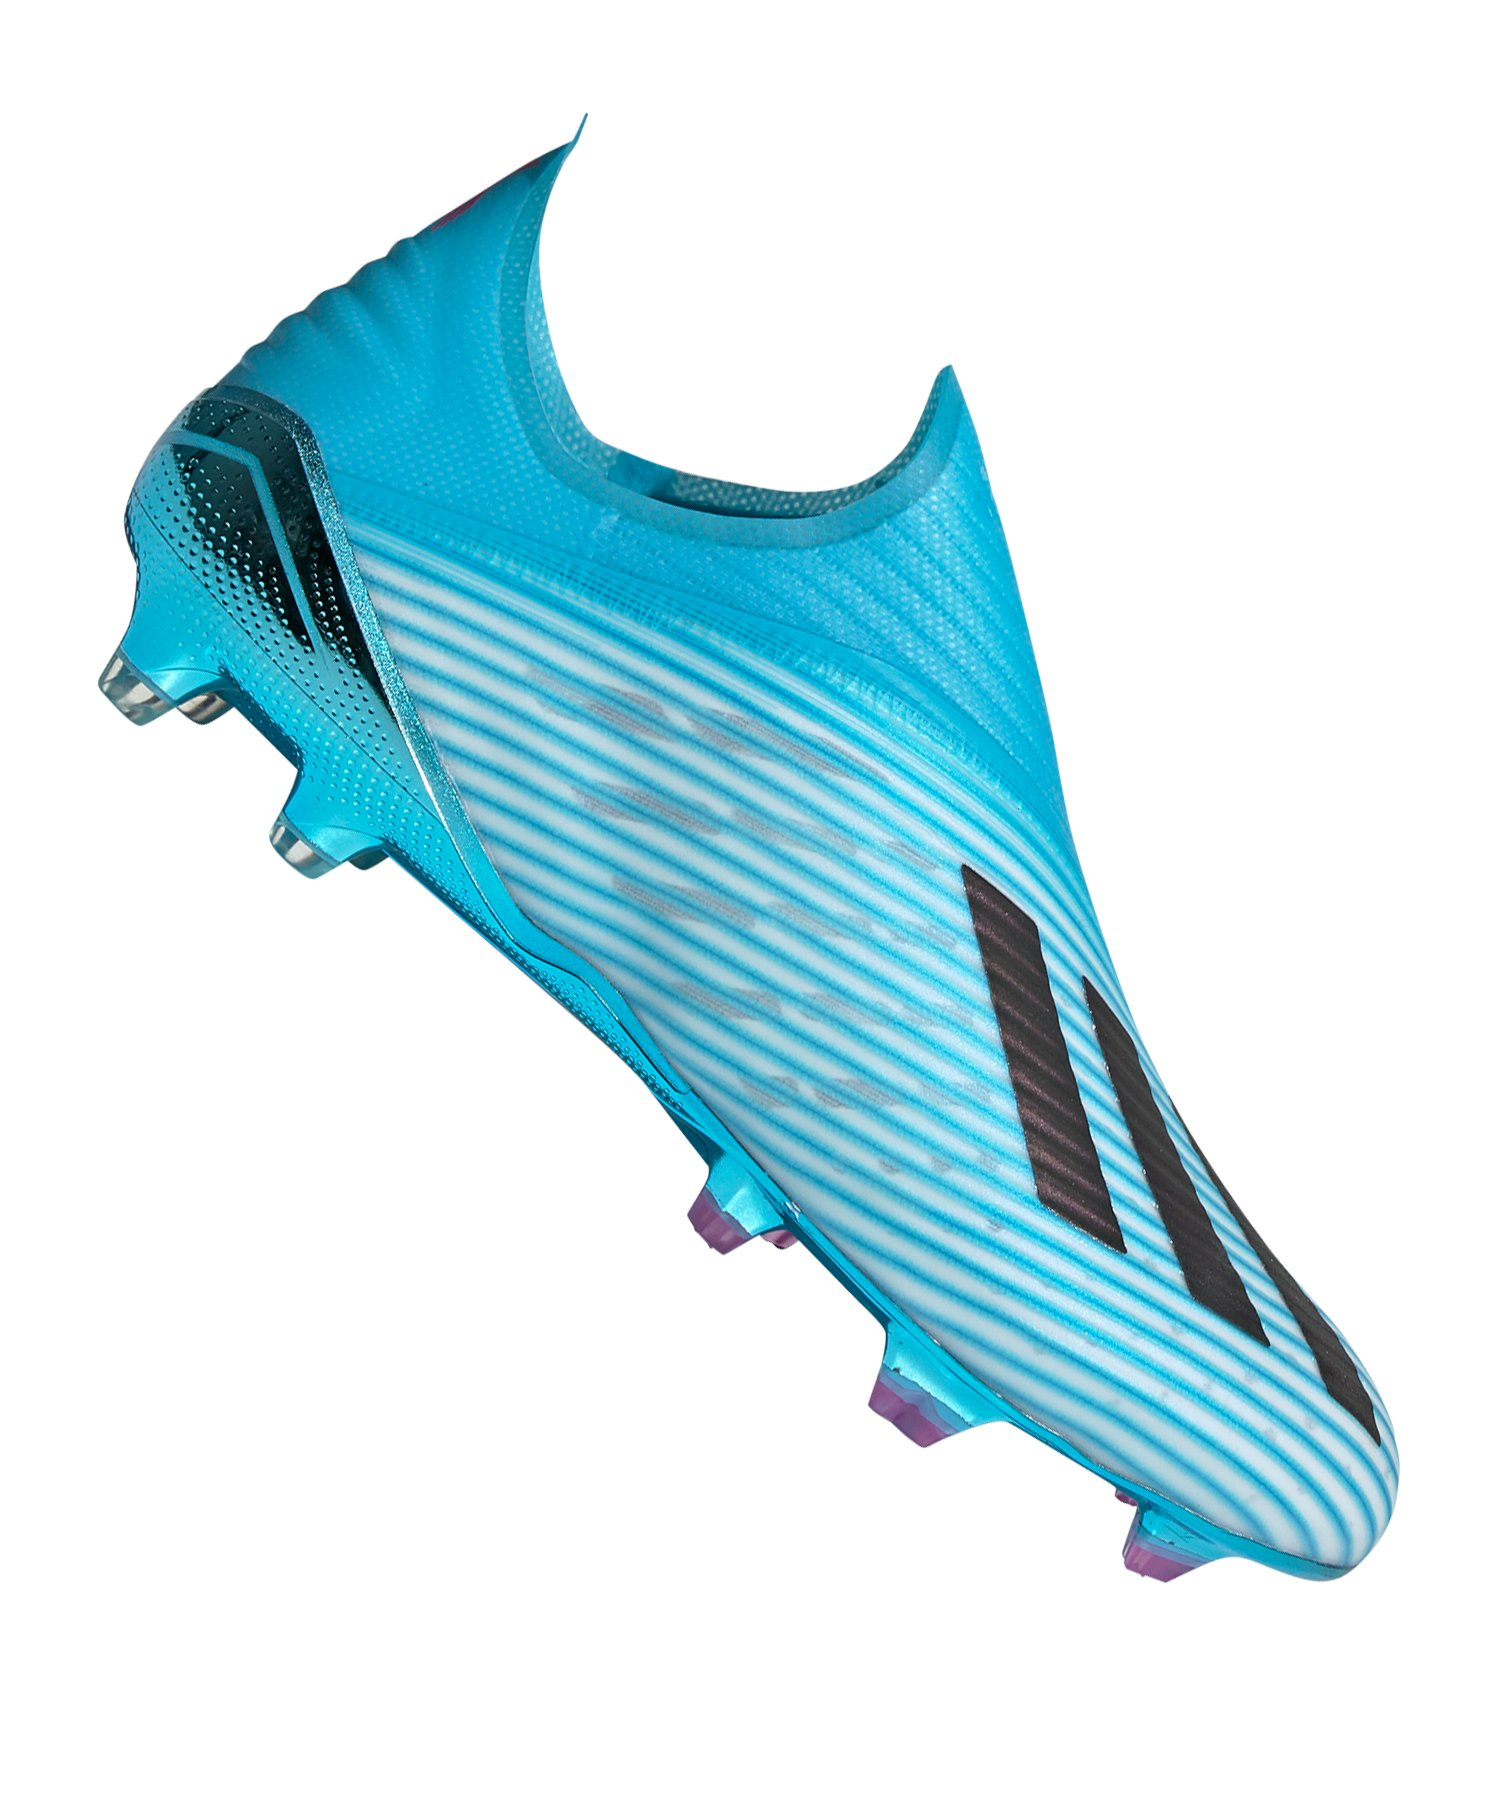 adidas Fussballschuh X 19+ FG